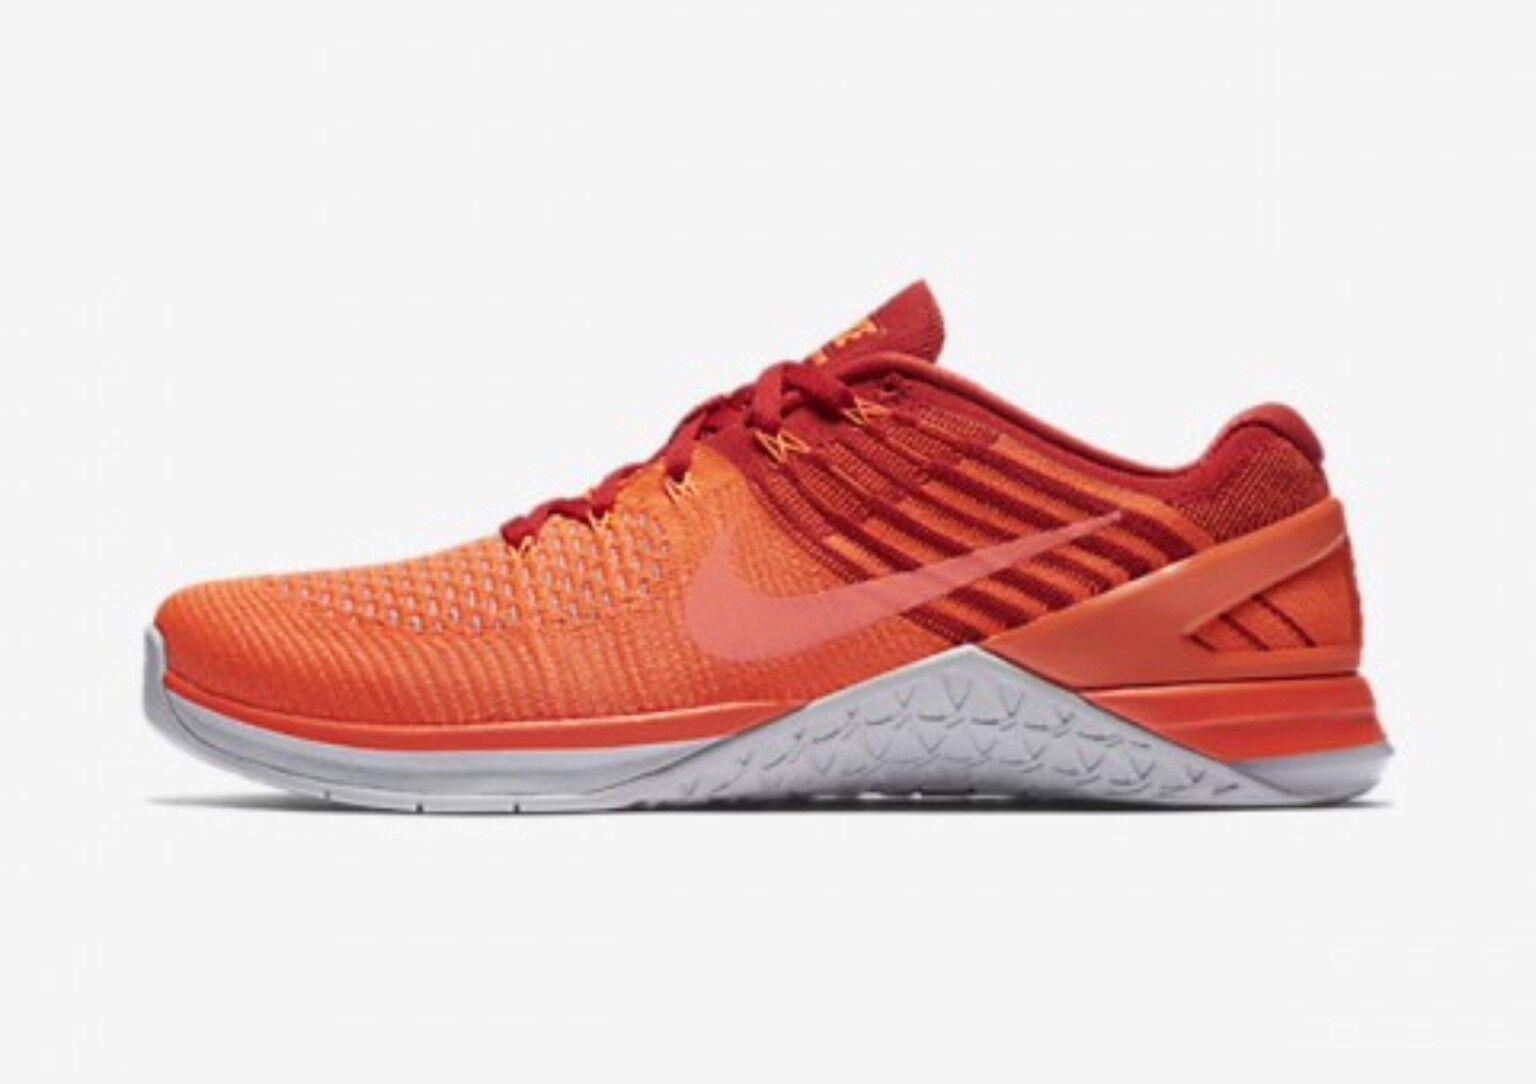 purchase cheap aa351 9b970 Nike Metcon DSX Flyknit Cross Training UK9.5 EU44.5 US10.5 EntièreHommes t  t t neuf dans sa bo te no lid852930-800 b78473